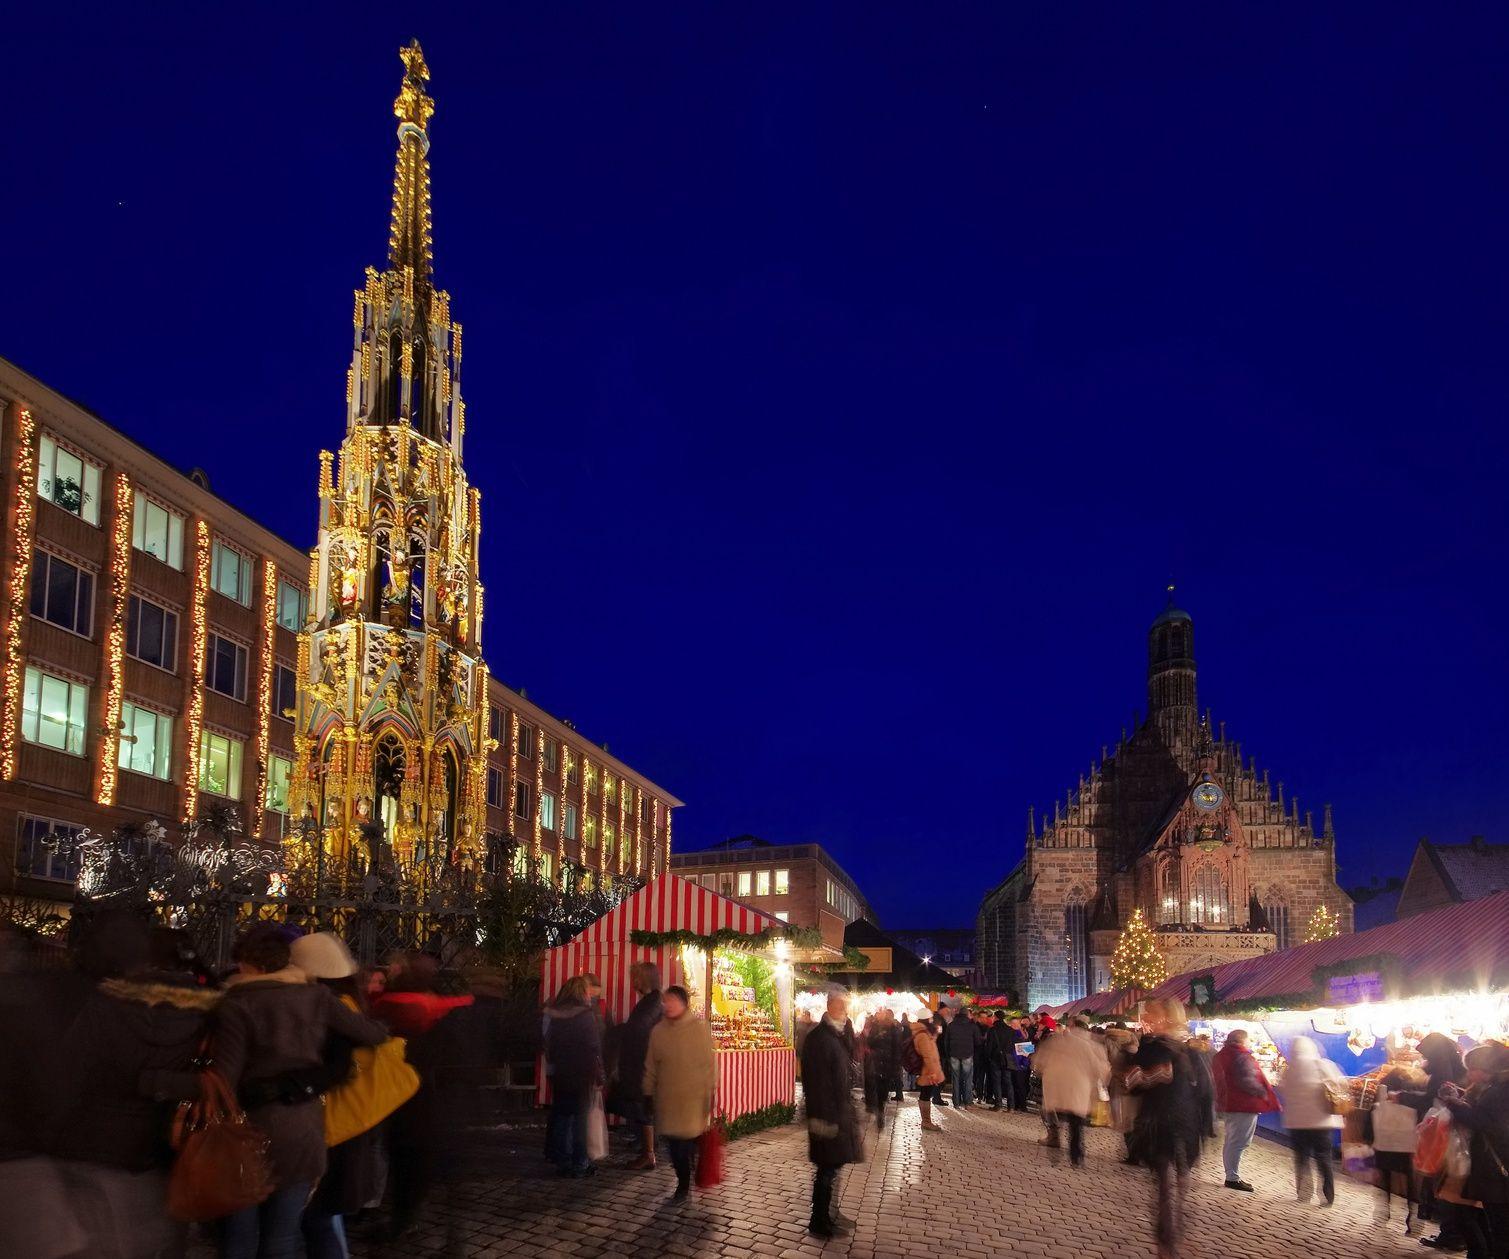 Nürnberg Christkindlmarkt